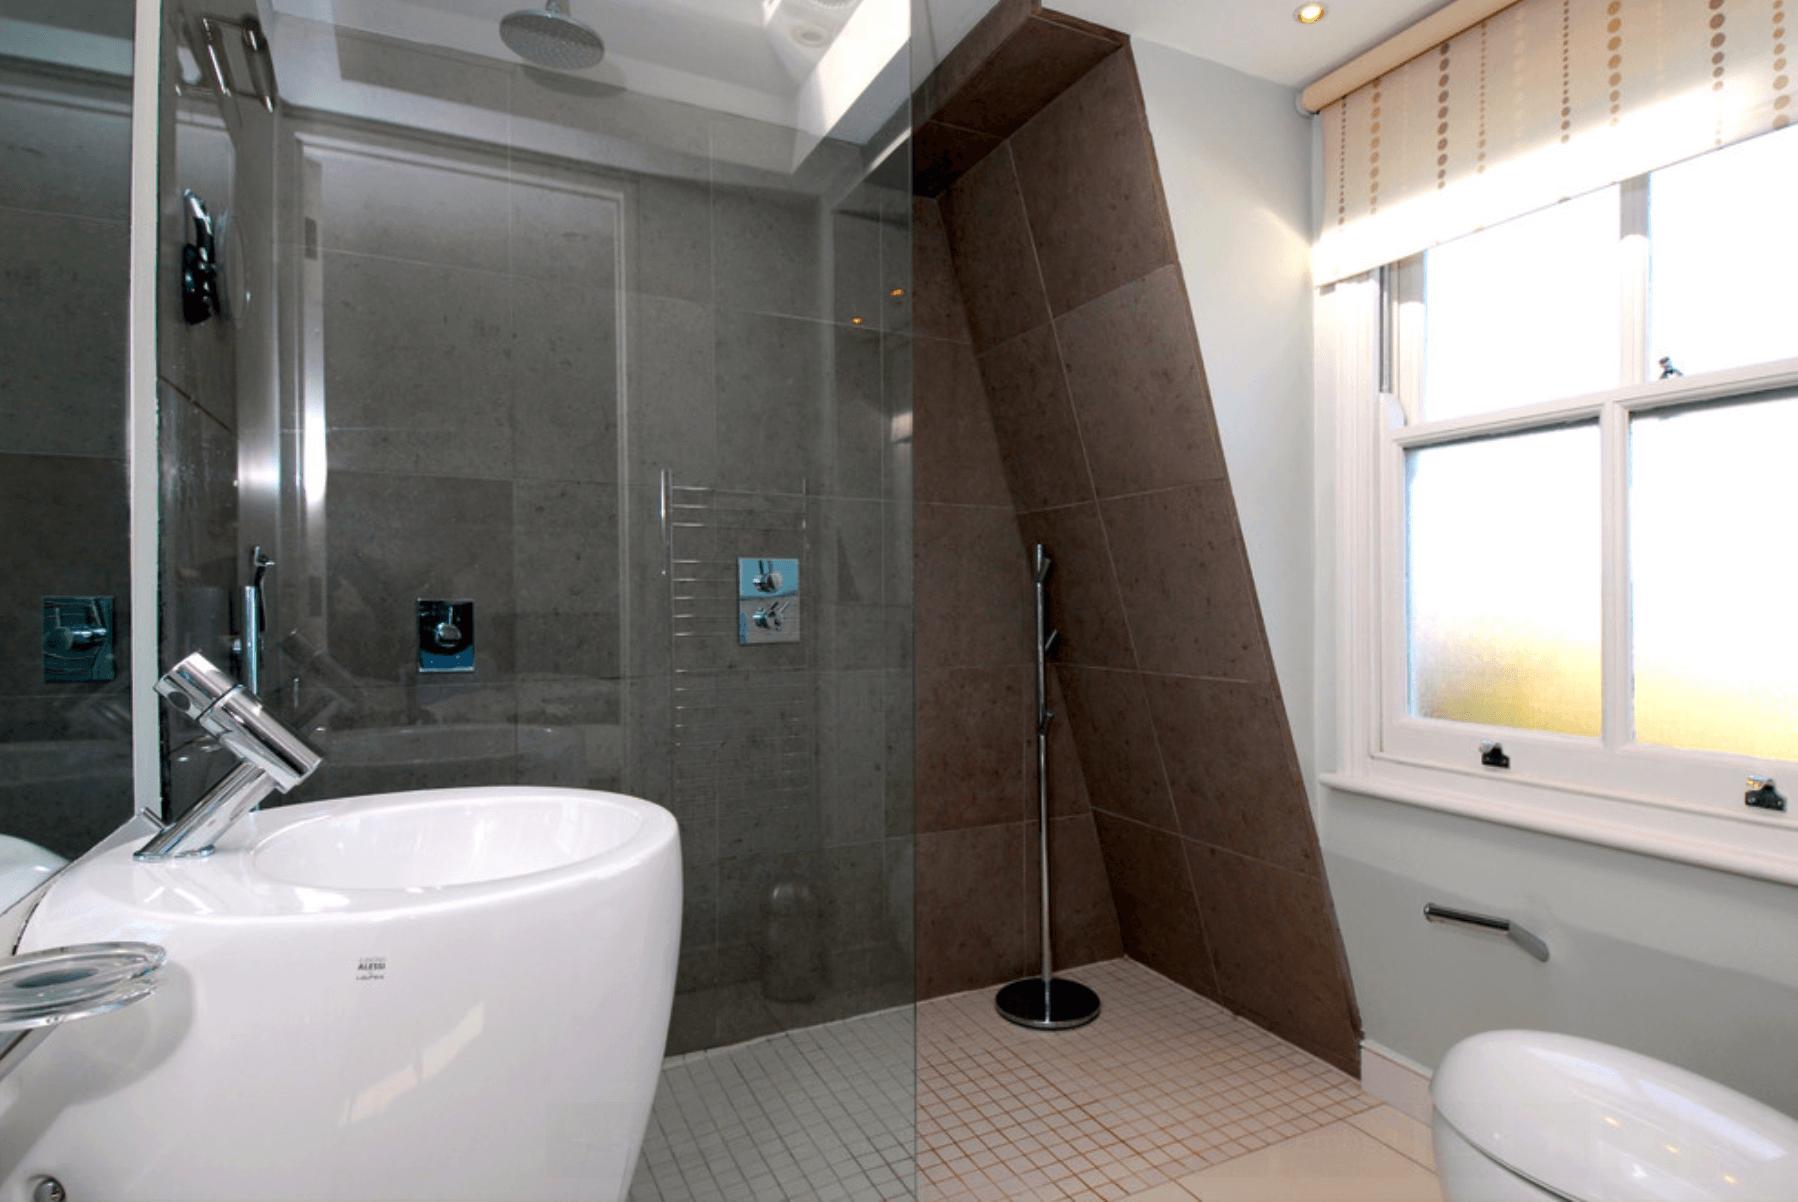 Banheiro Simples Pequeno E Bonito  homefiresafetykitcom banheiros com pasti # Banheiros Pequeno Bonito